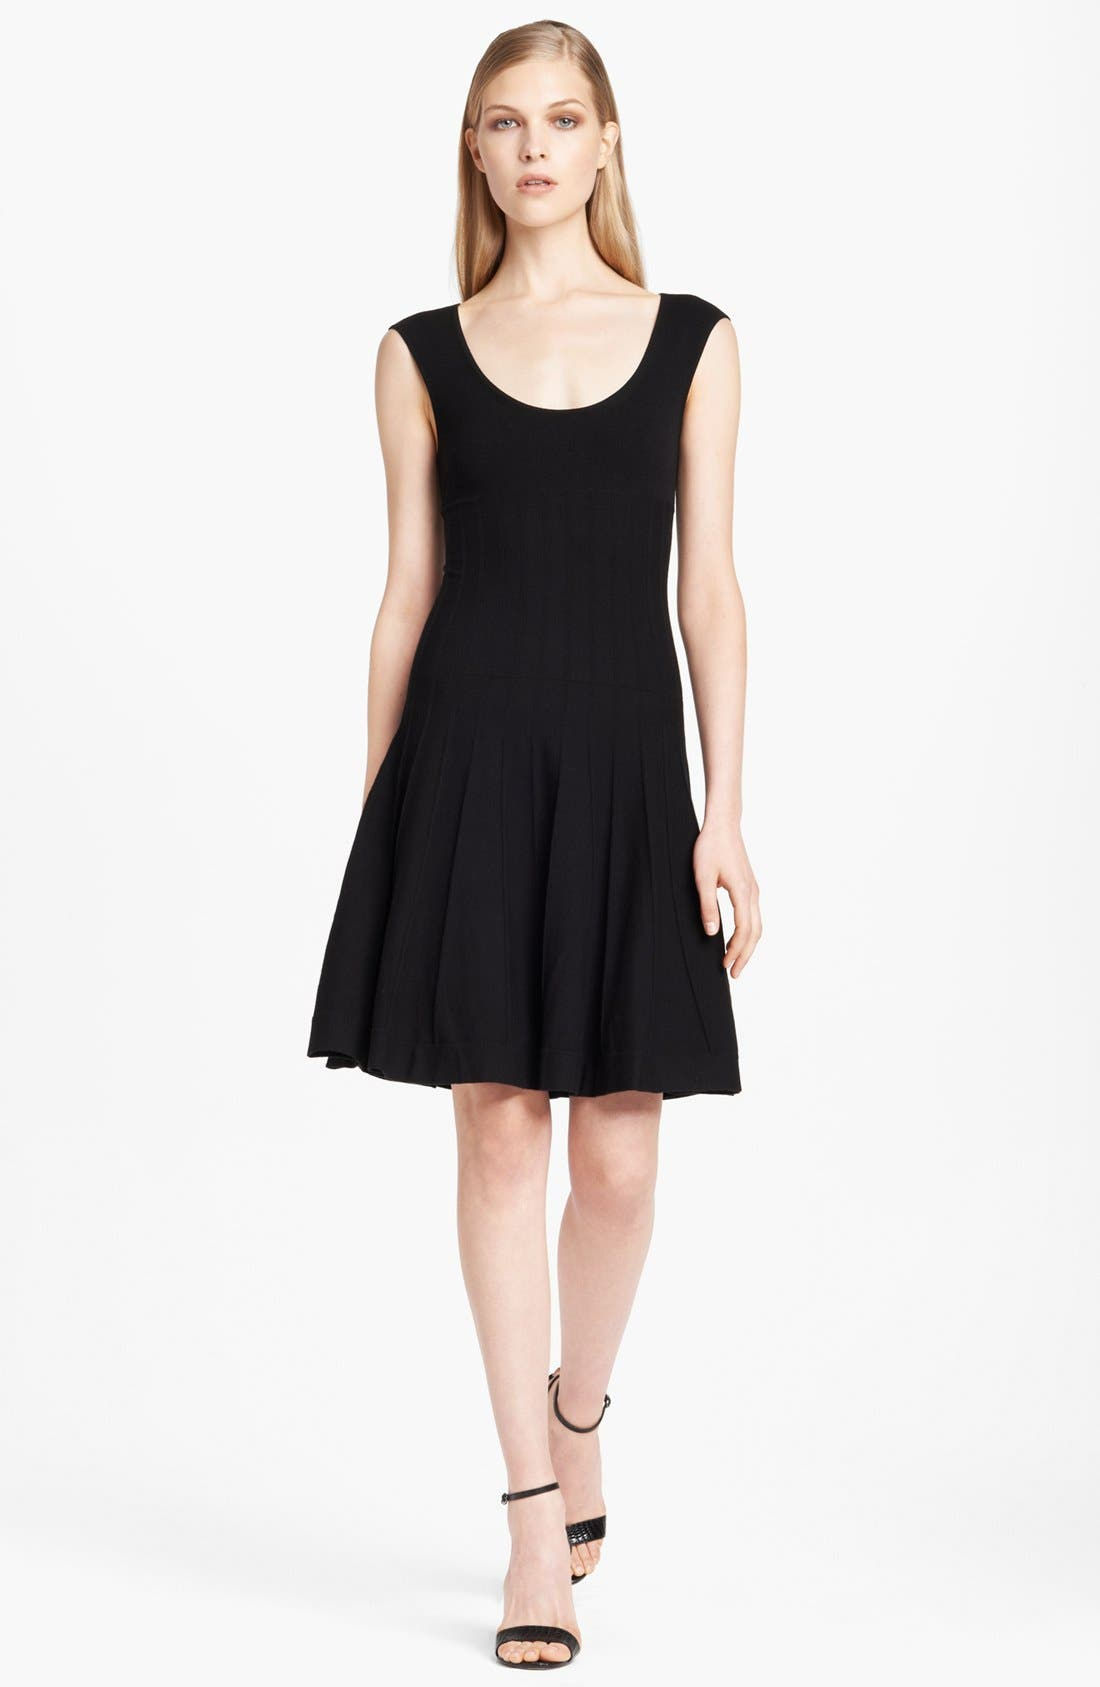 Alternate Image 1 Selected - Donna Karan Collection Cap Sleeve Fit & Flare Dress